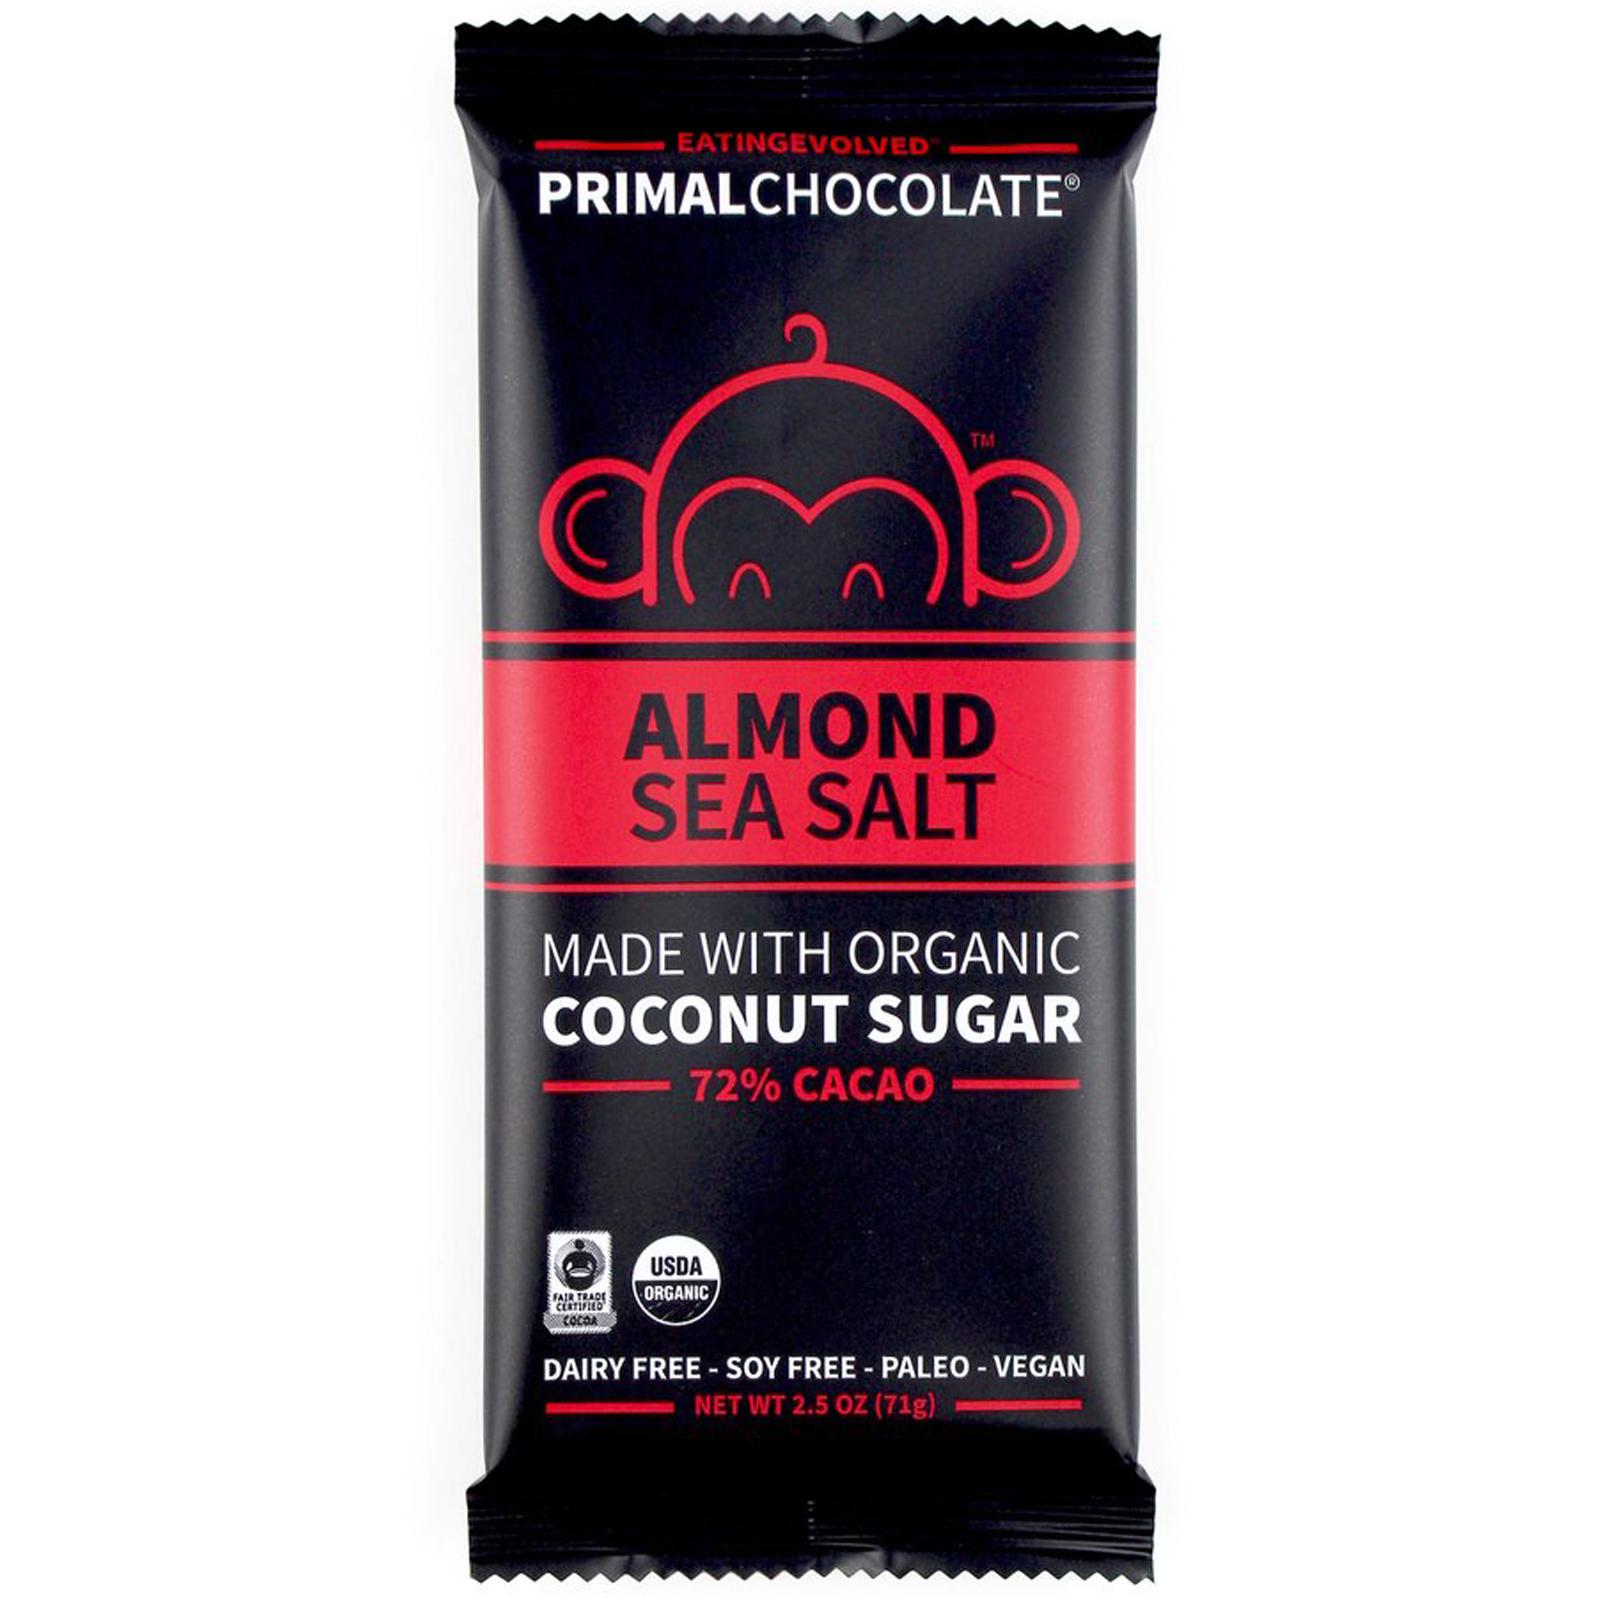 Evolved Chocolate, プライマルチョコレート、アーモンド&シーソルト72%カカオ、2.5 oz (71 g)